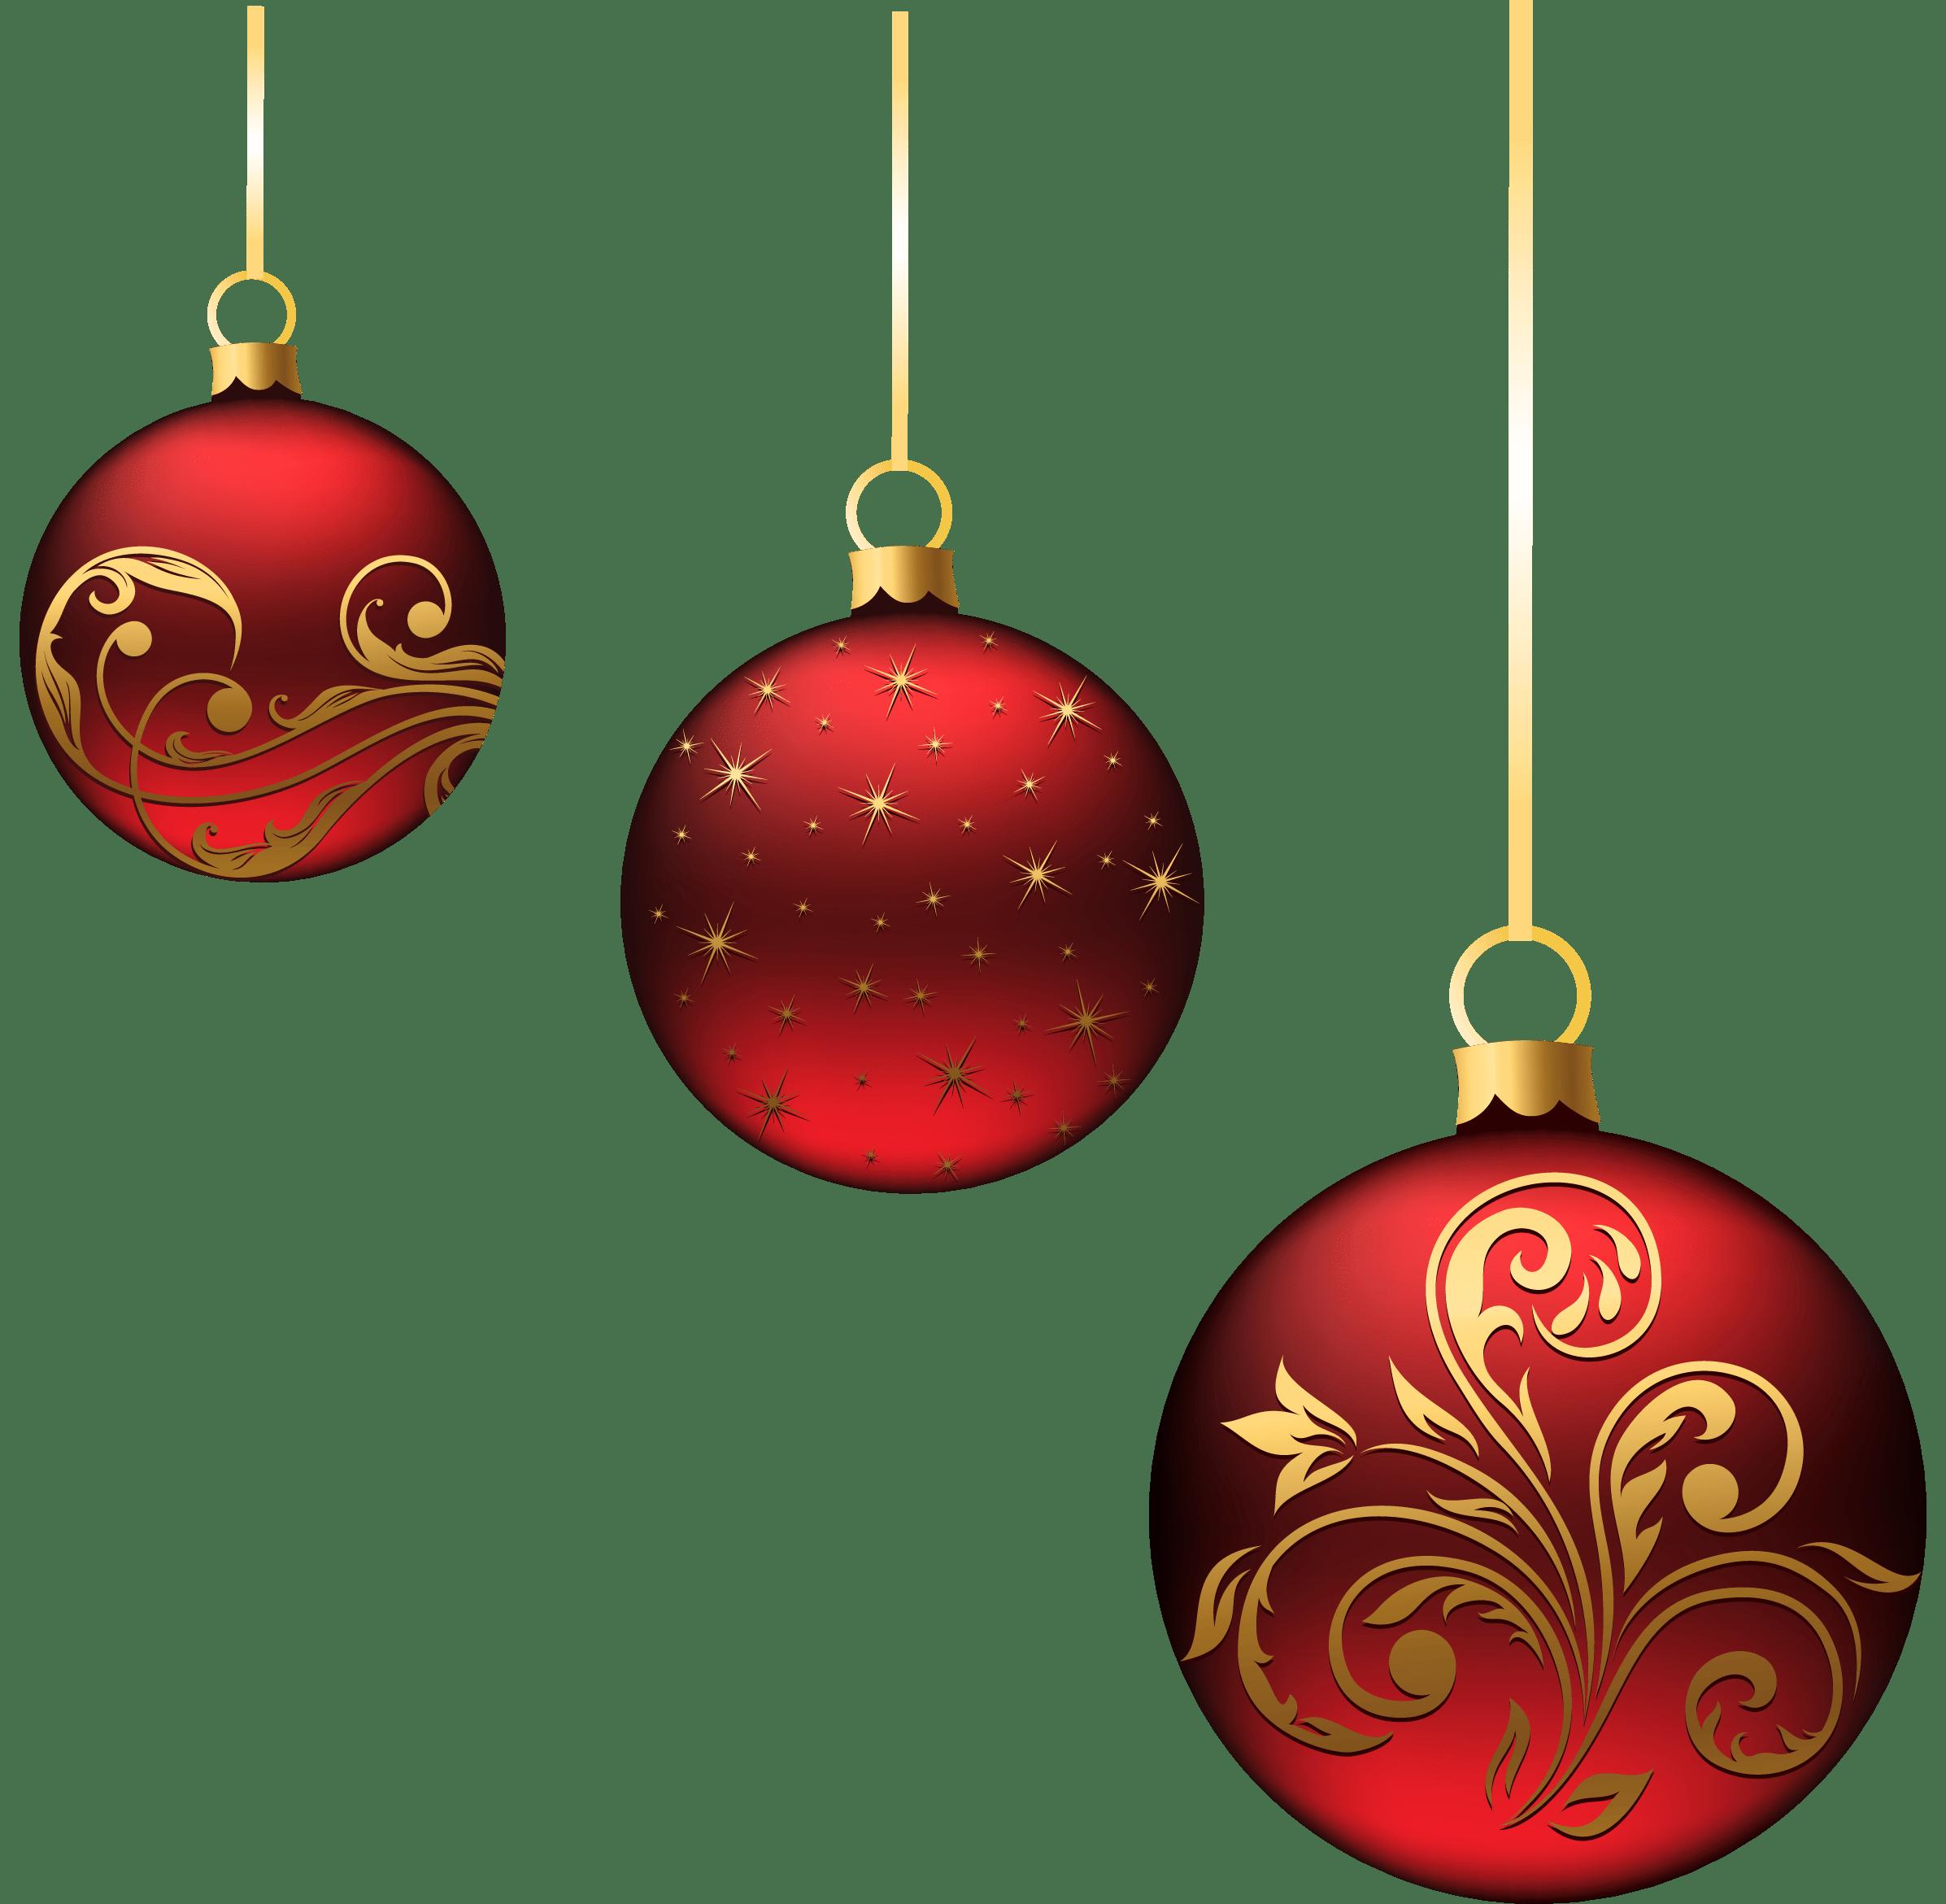 Ornament holiday ornament